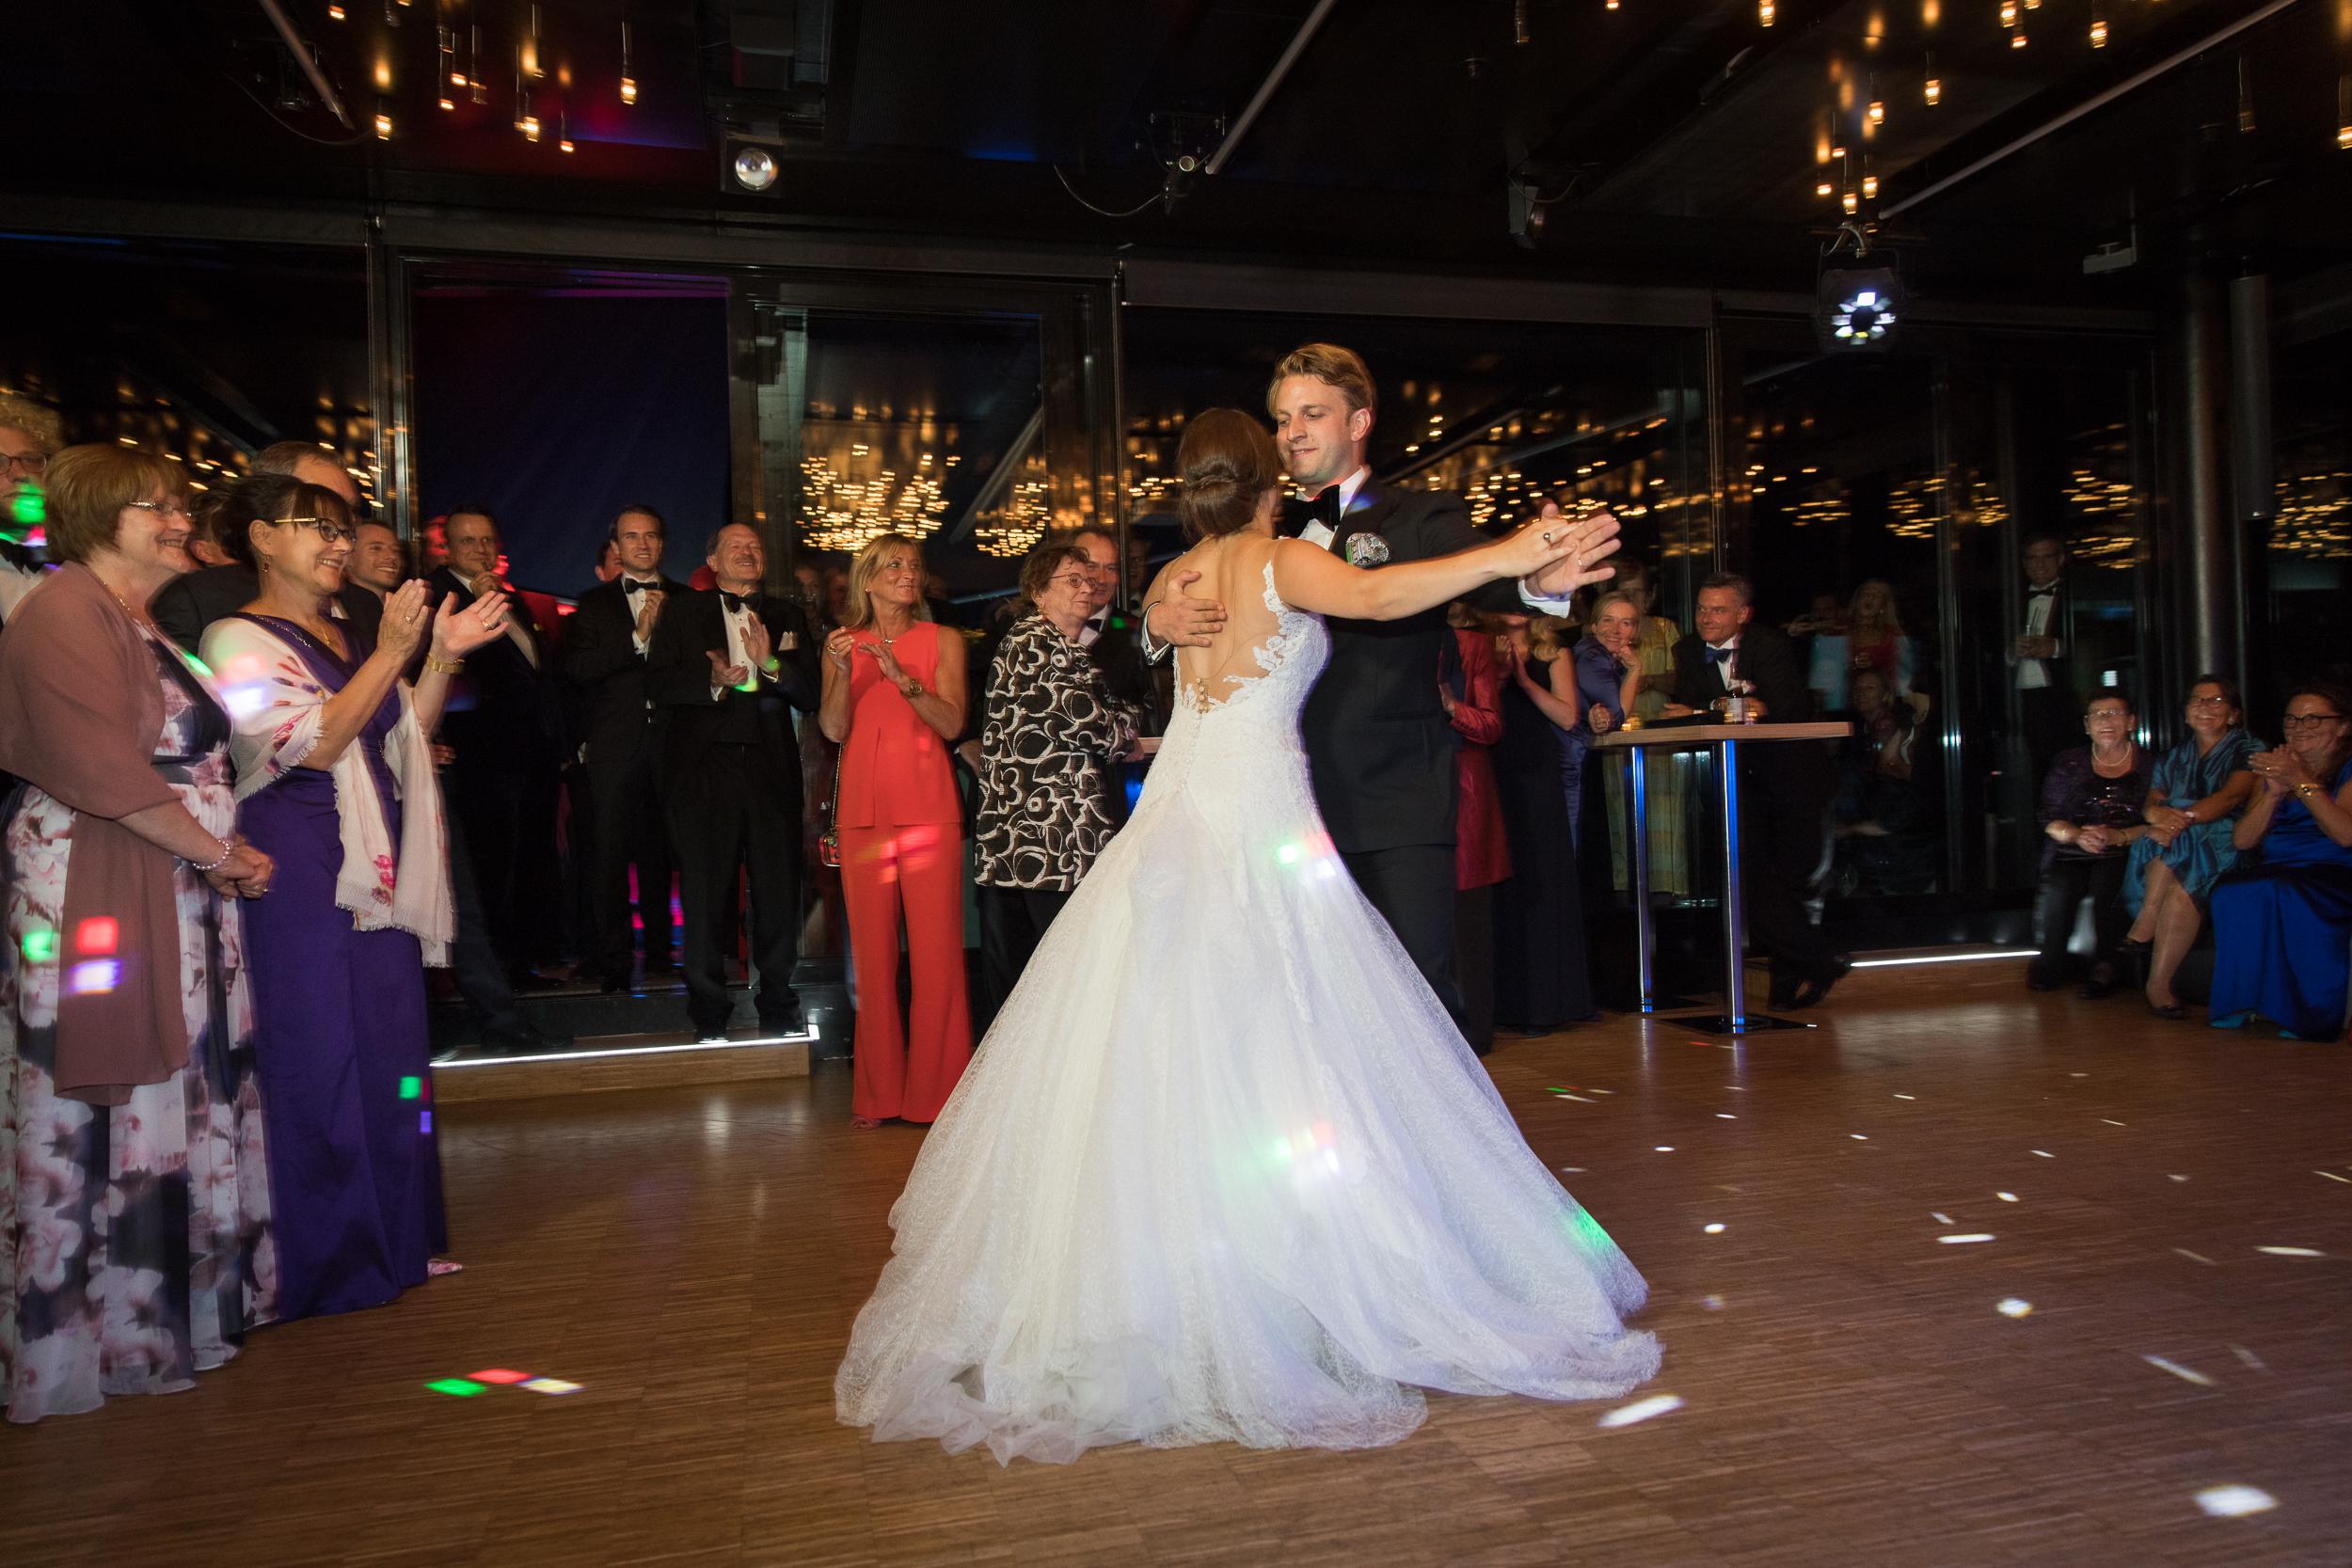 Gregg_Thorne_Wedding_Photographer_Munich_083.jpg